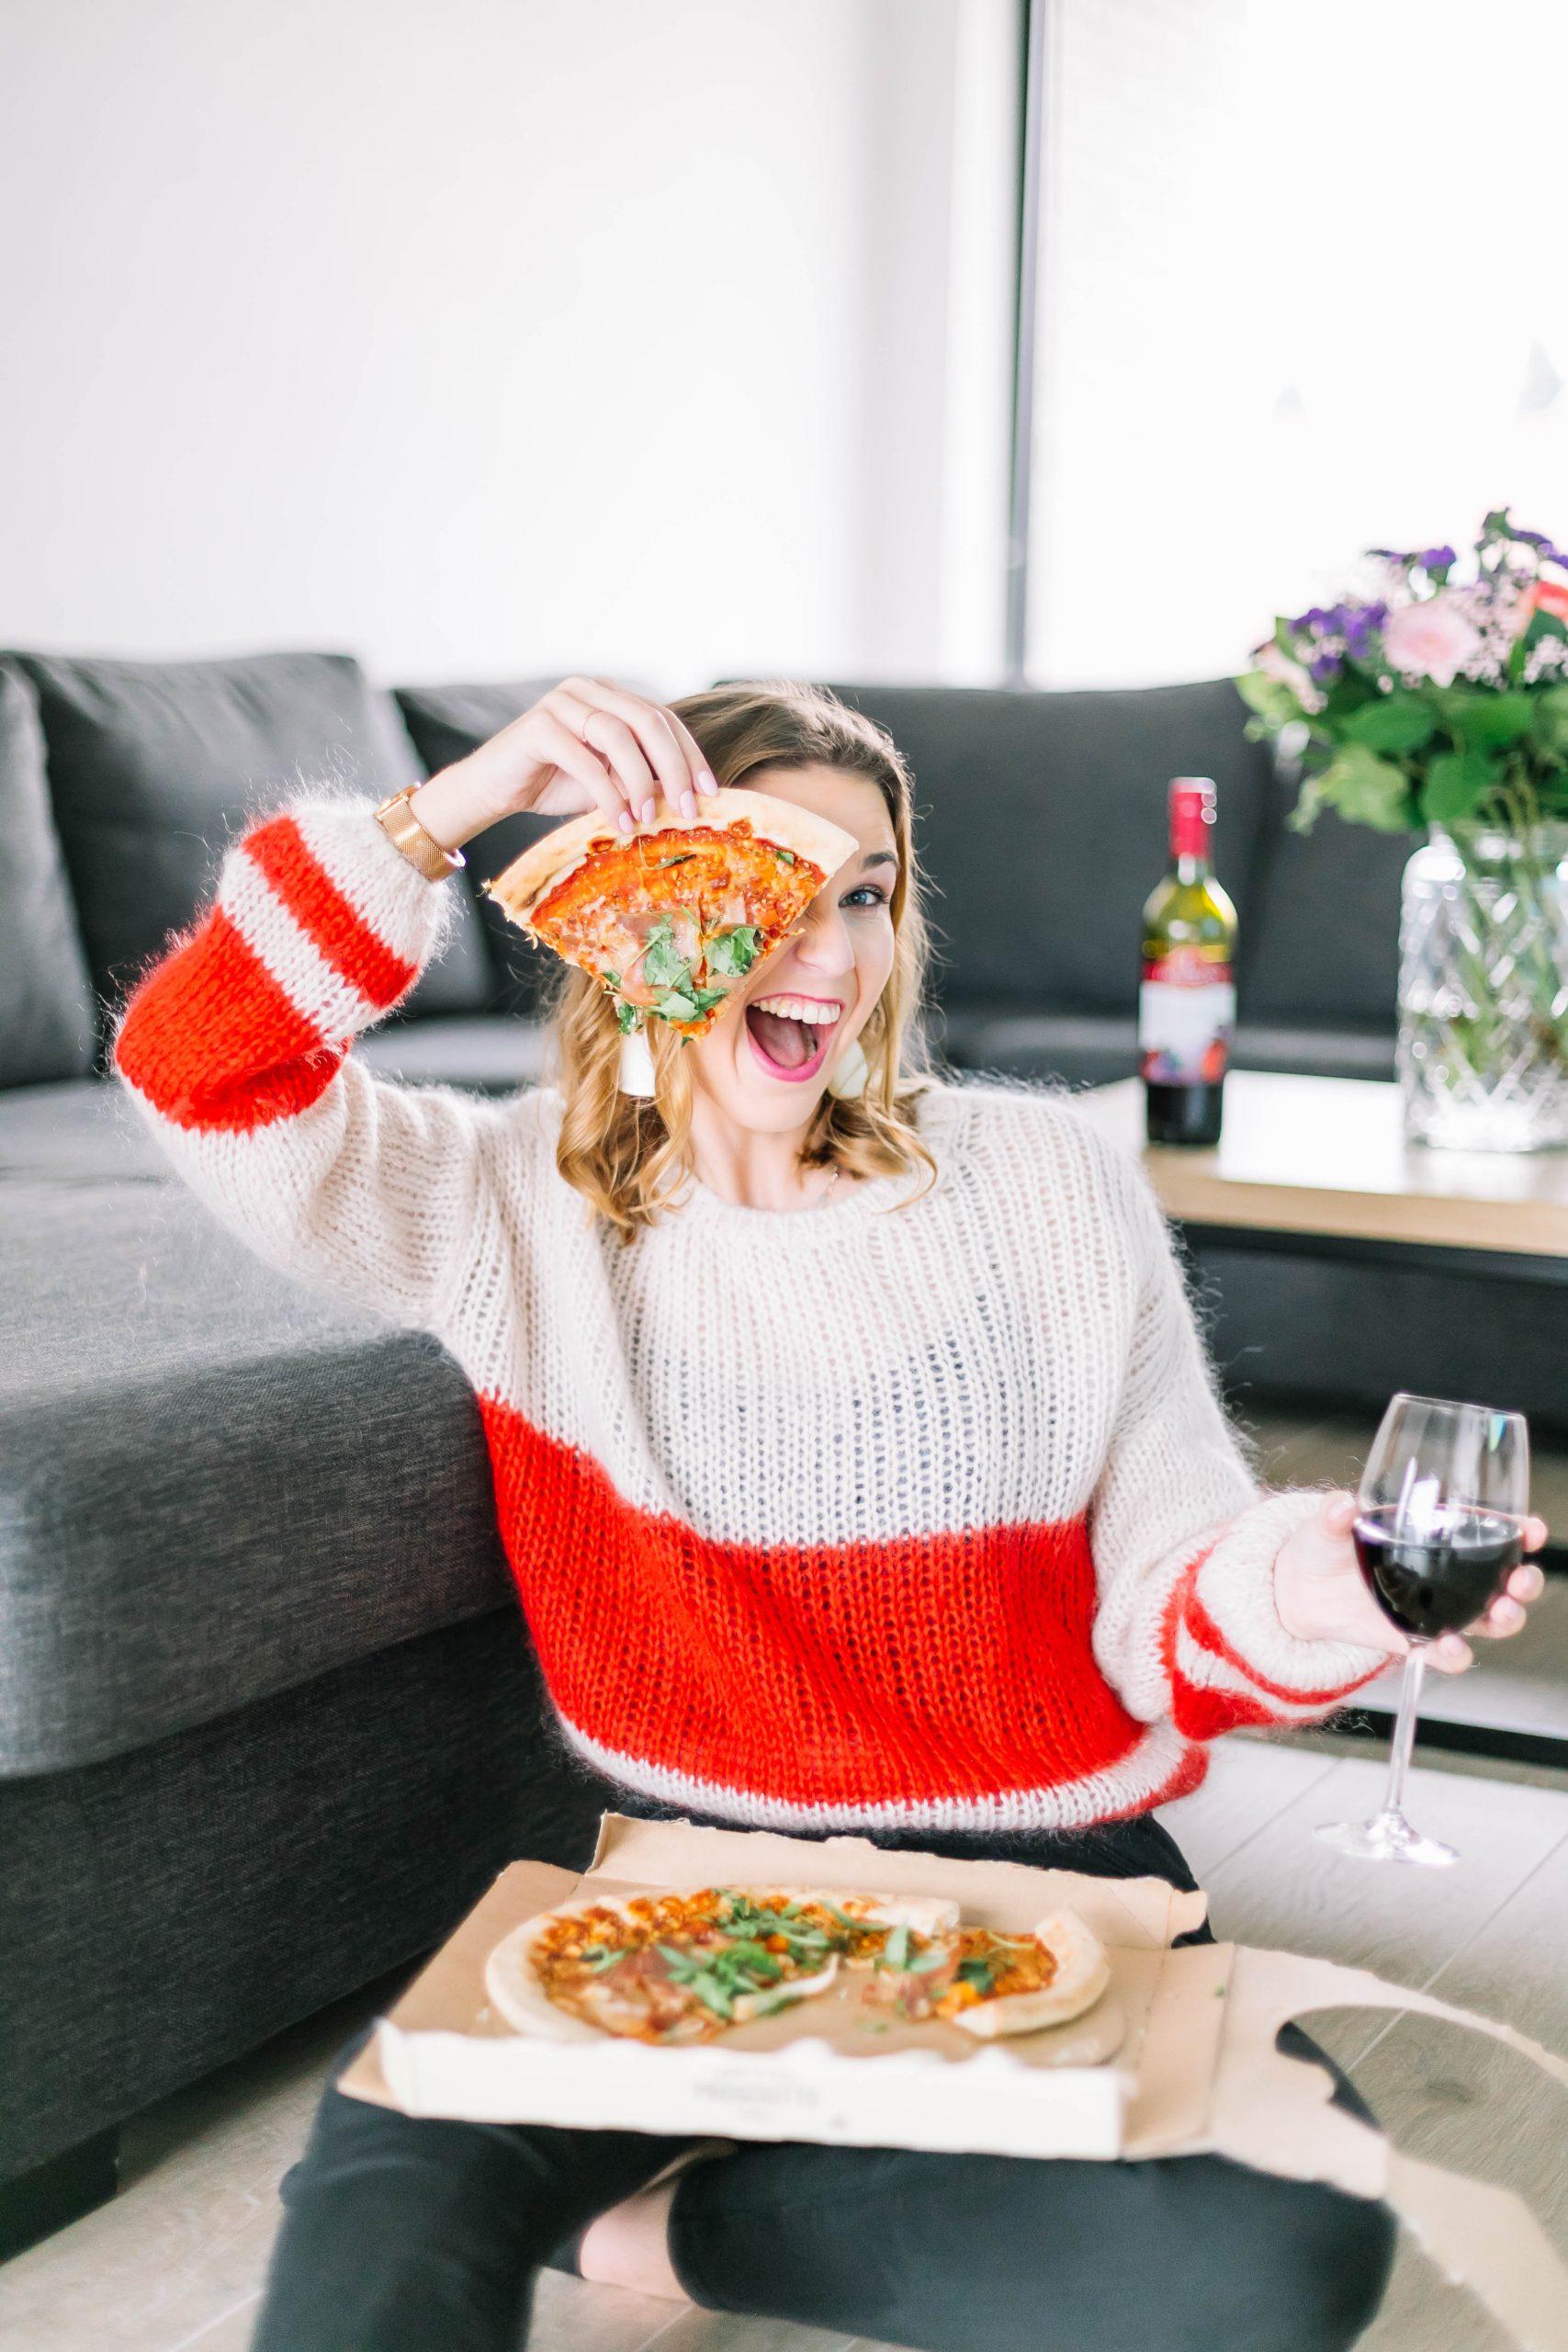 Healthy Habits Celien Rombouts